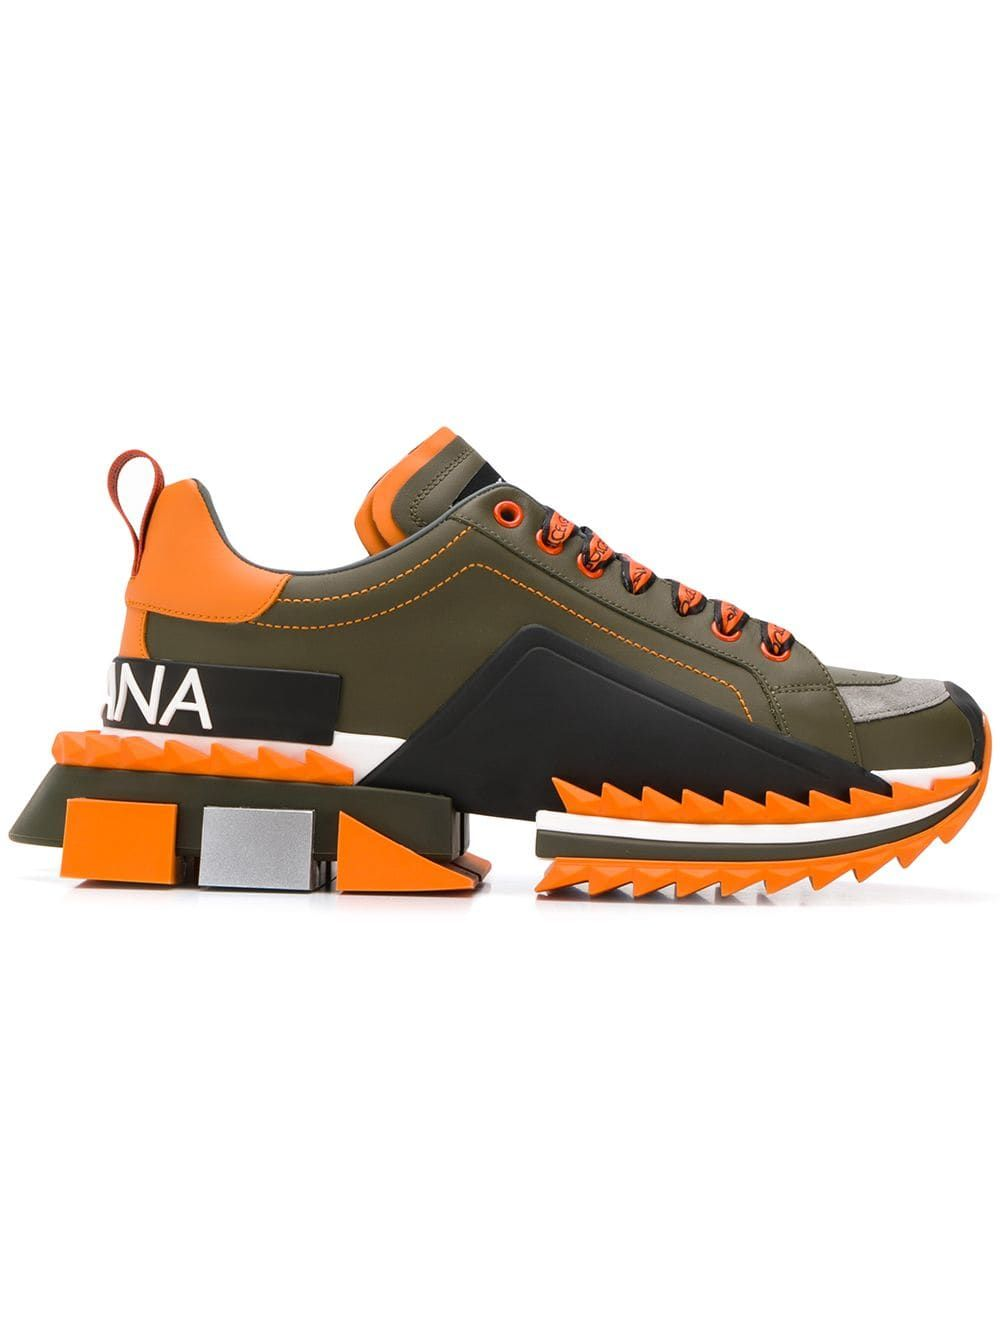 Dolce Gabbana Dolce Gabbana Super King Sneakers Green Dolcegabbana Shoes Sneakers Men Fashion Dolce And Gabbana Man Sneakers Men